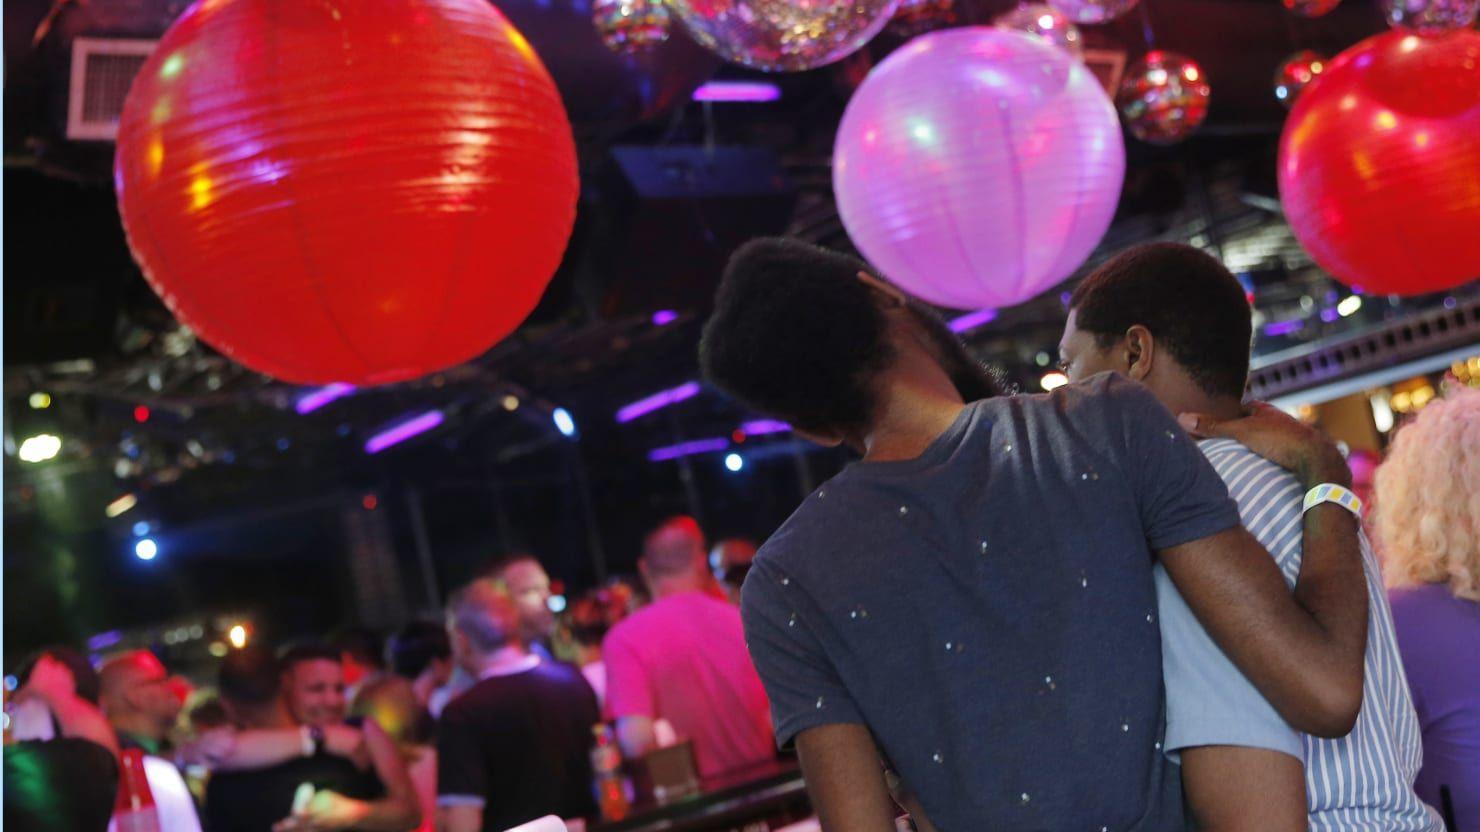 Gay bars clubs drag shows orlando